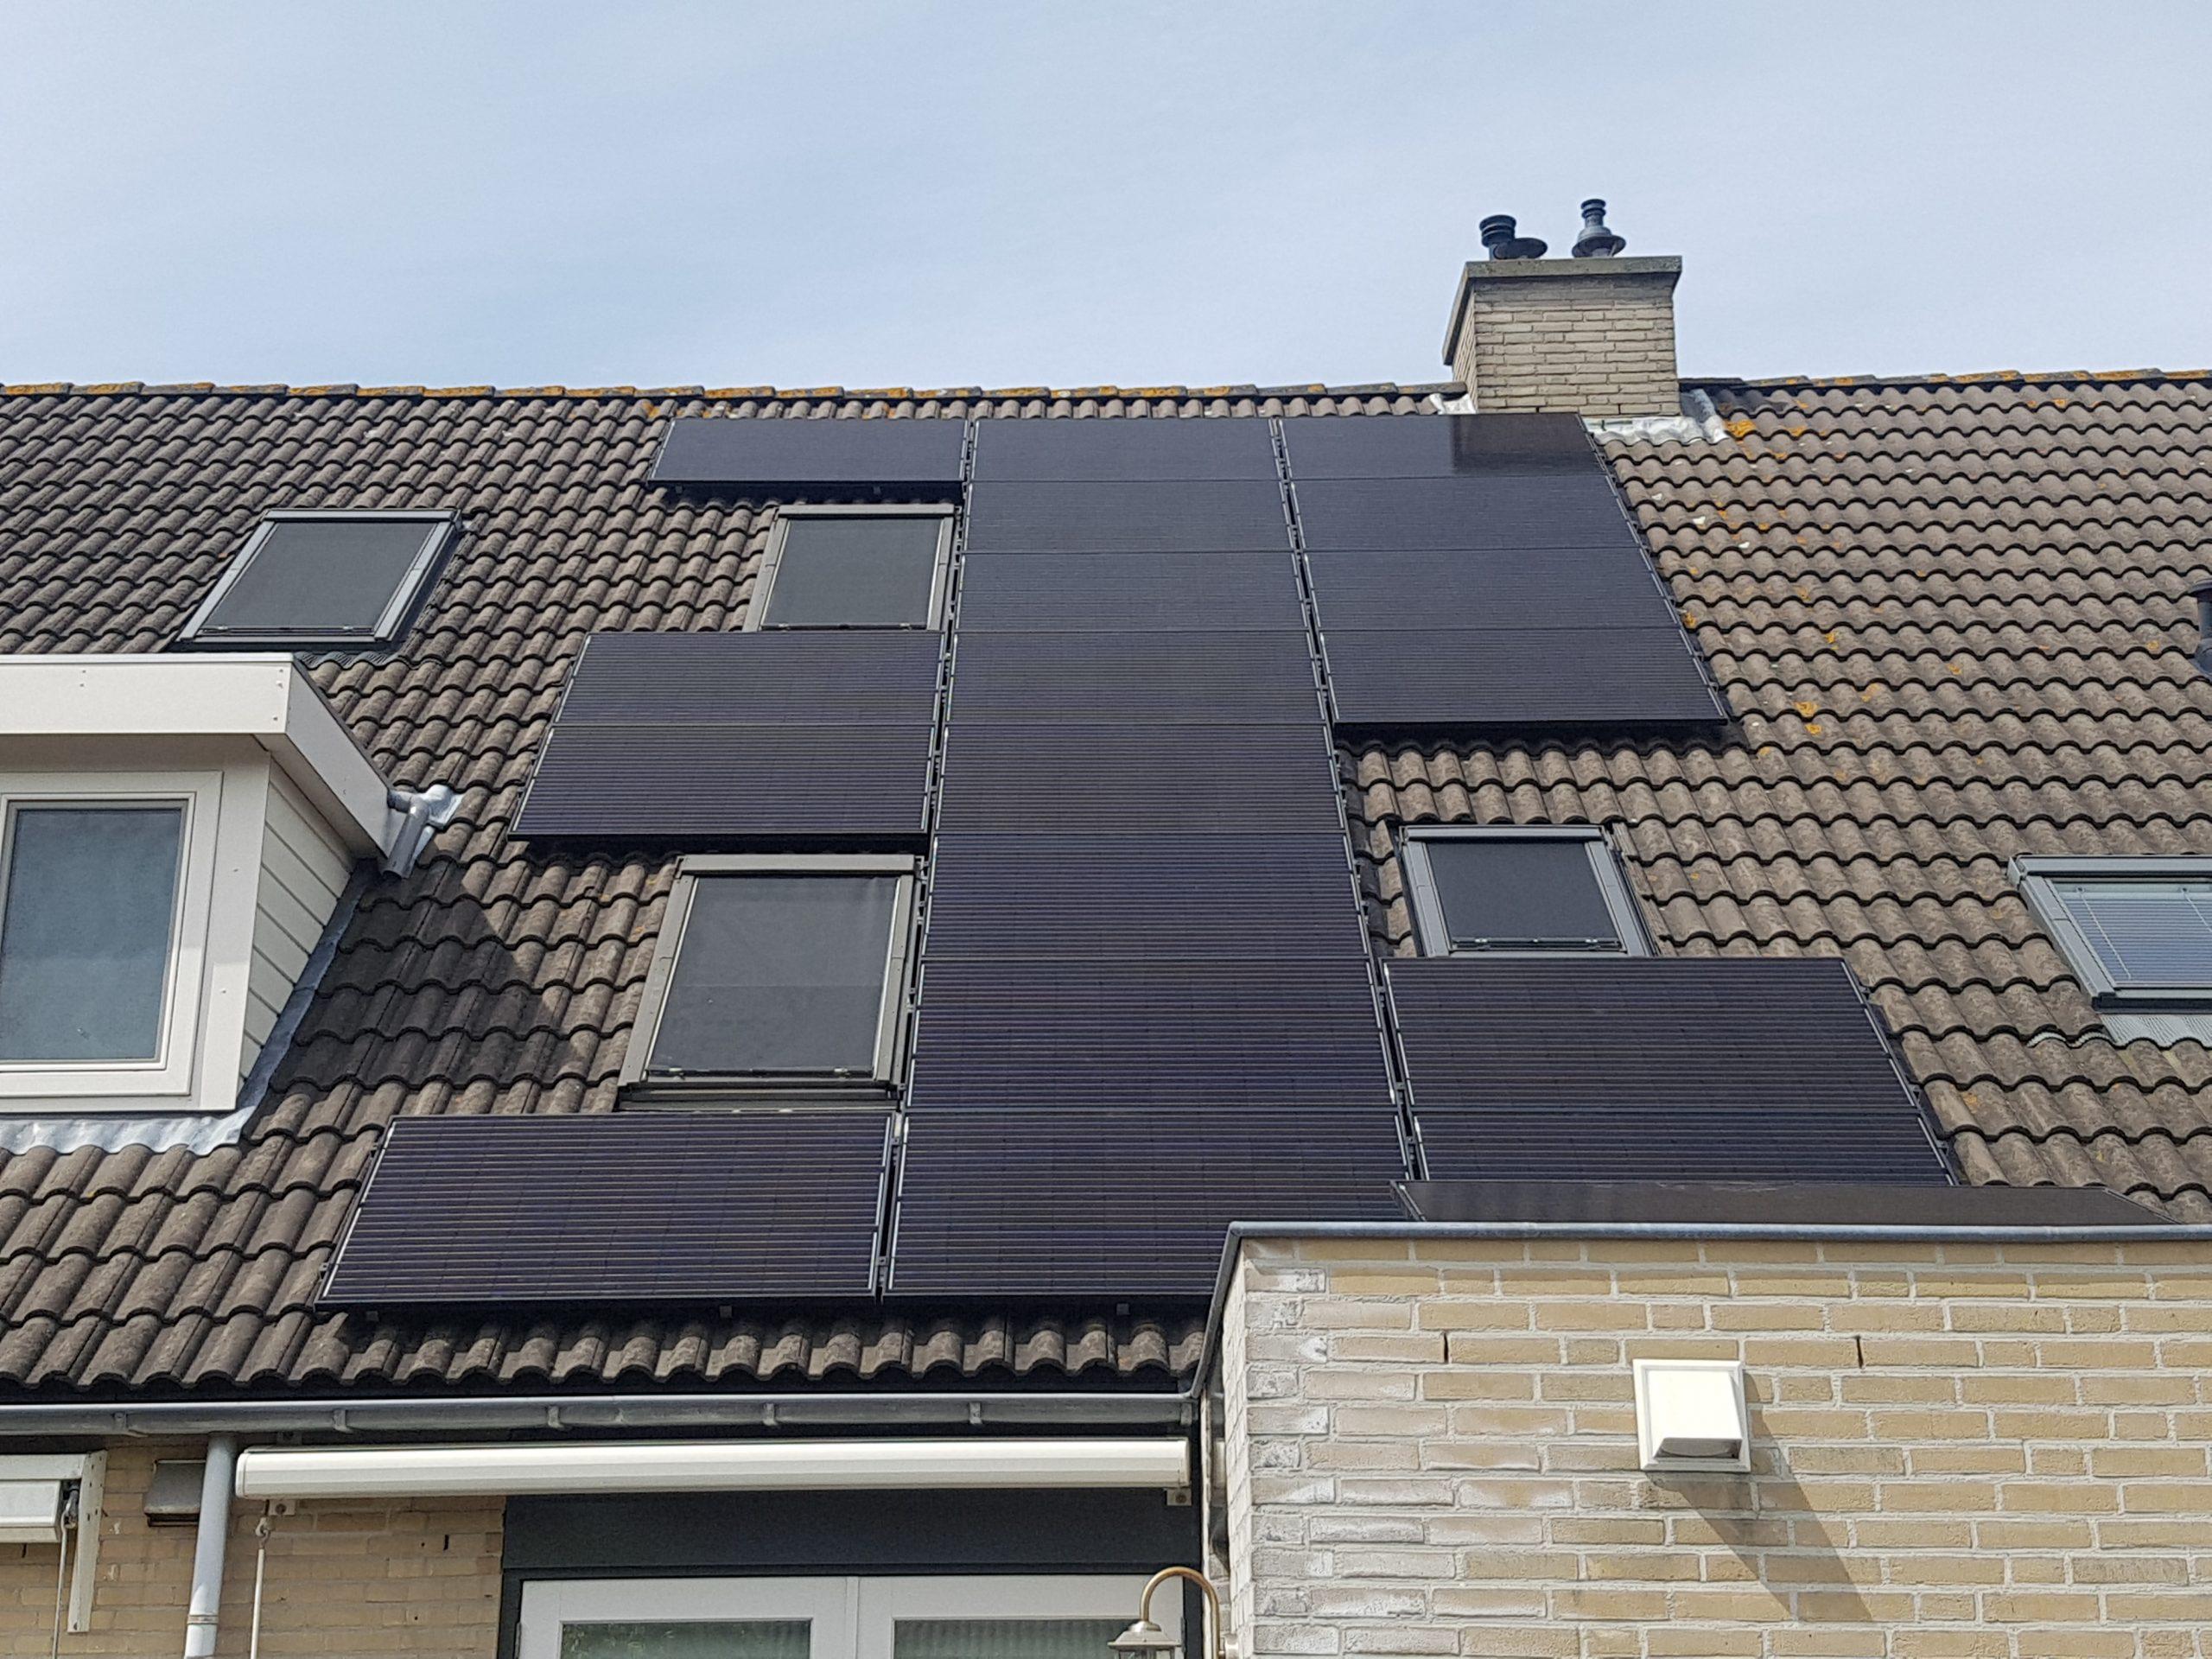 20180501 143545 Scaled, uw zonnepanelen Specialist